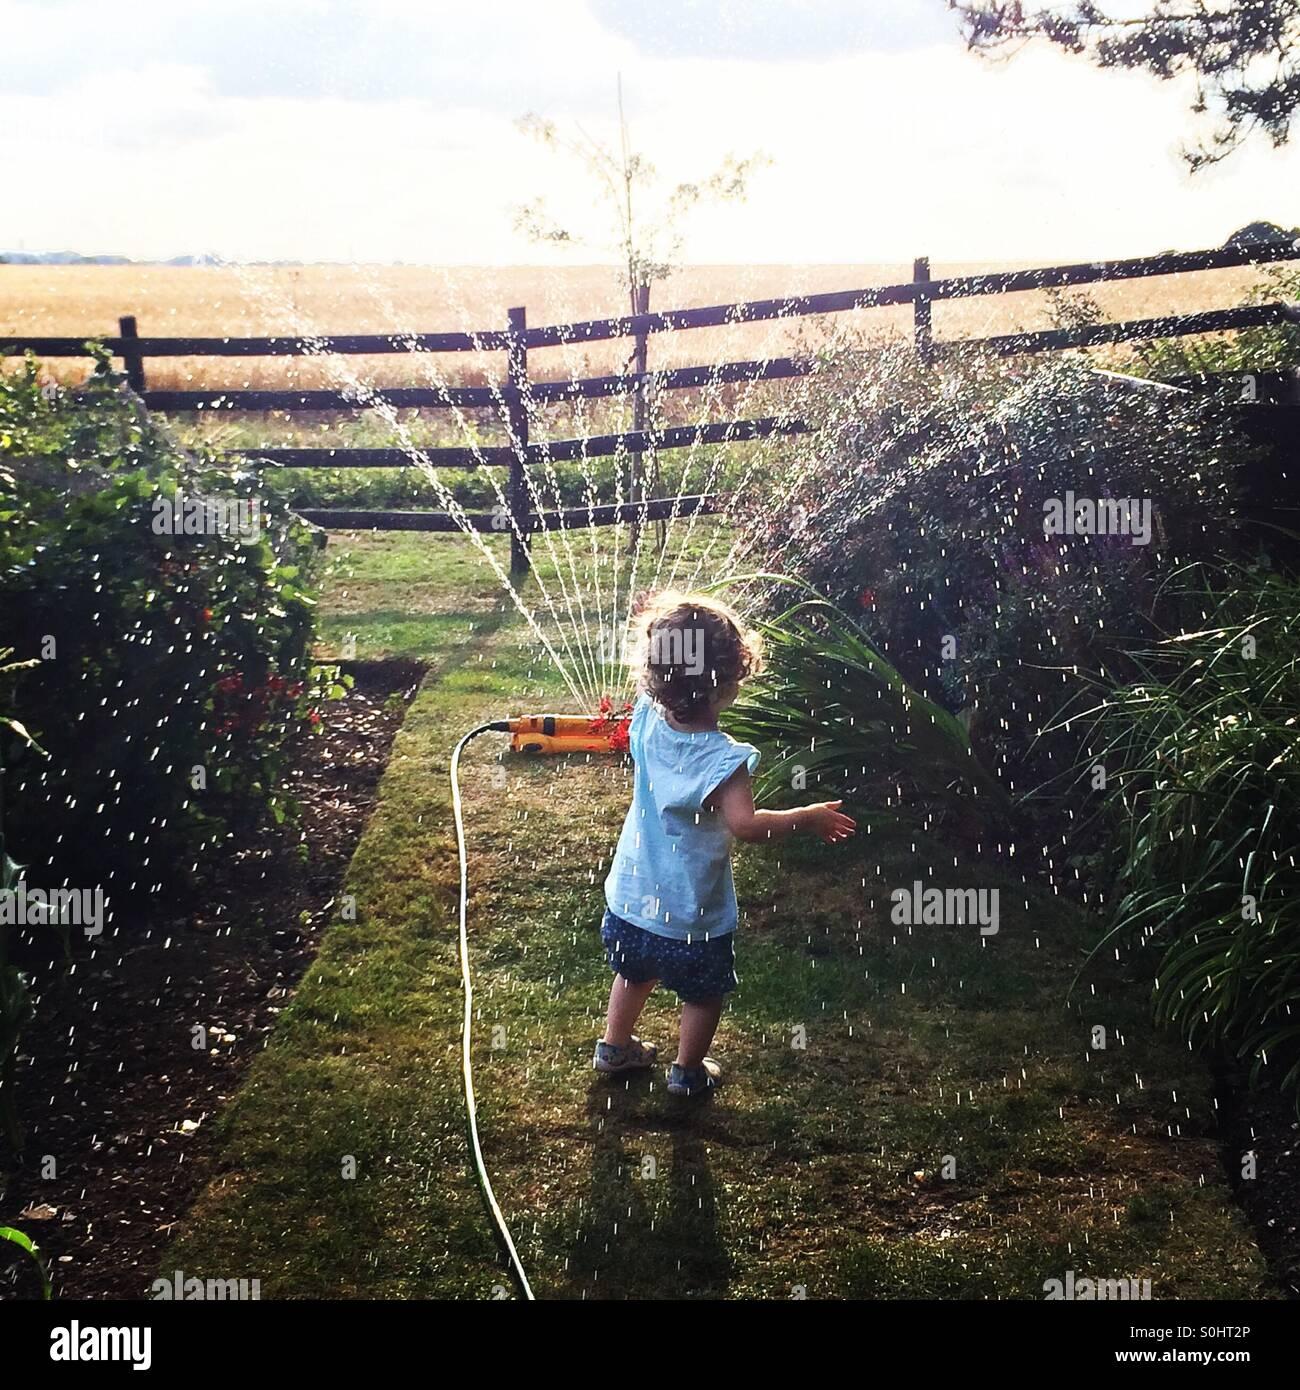 Bambina giocando con sprinkler REGNO UNITO Foto Stock